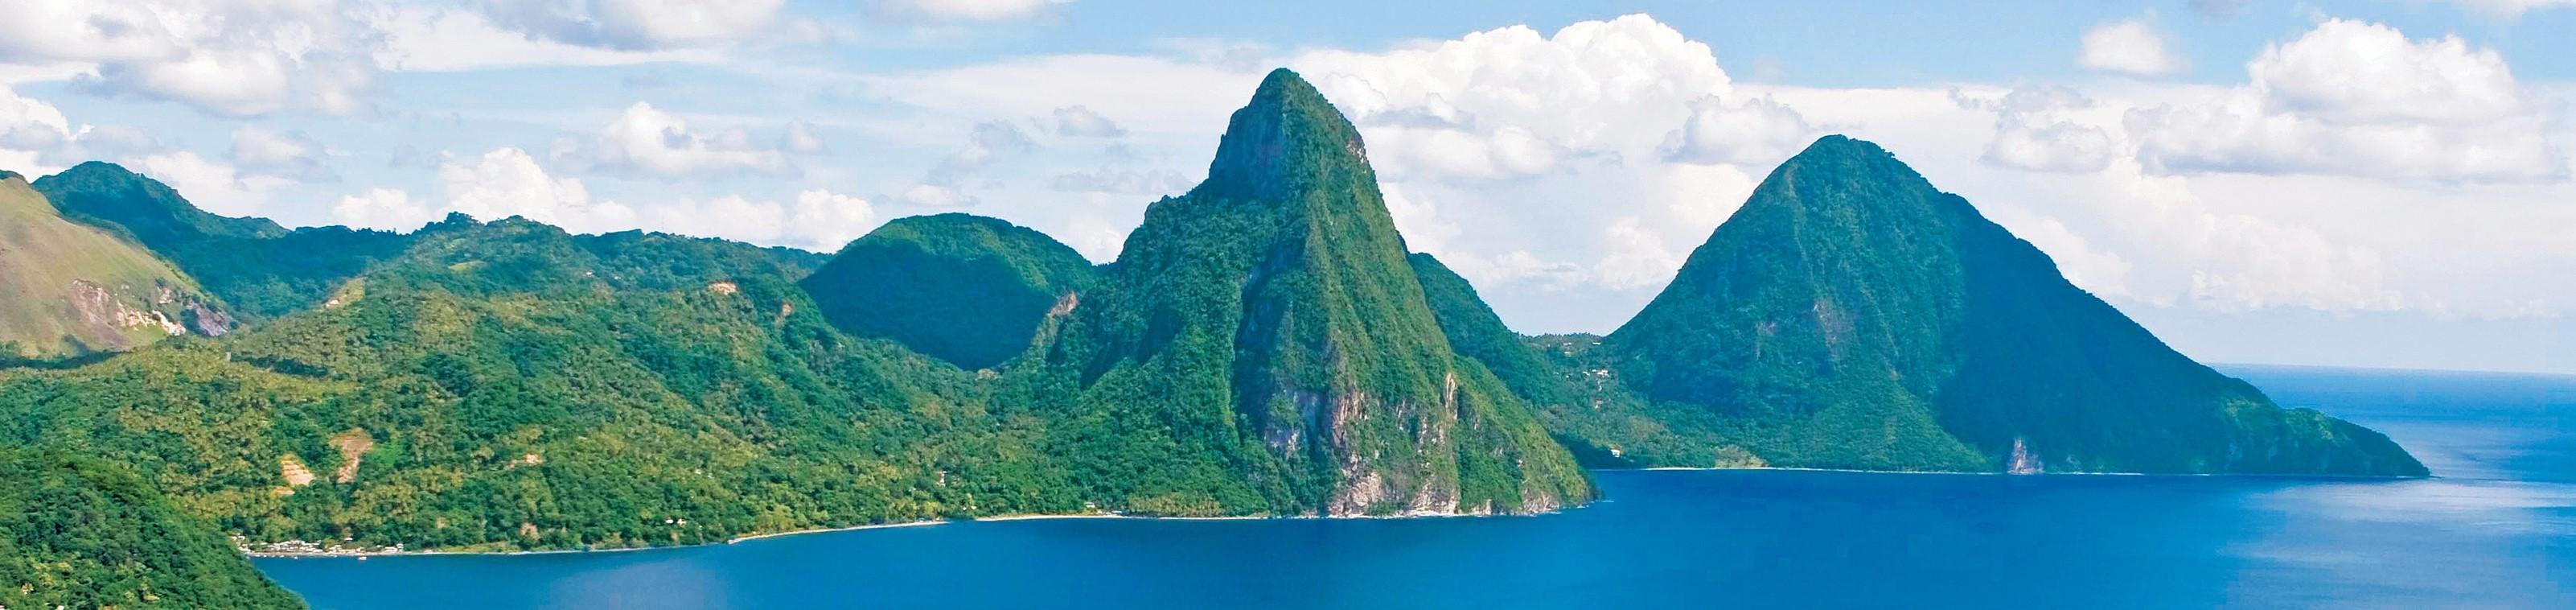 Luxe,charme en intimiteit op Saint Lucia